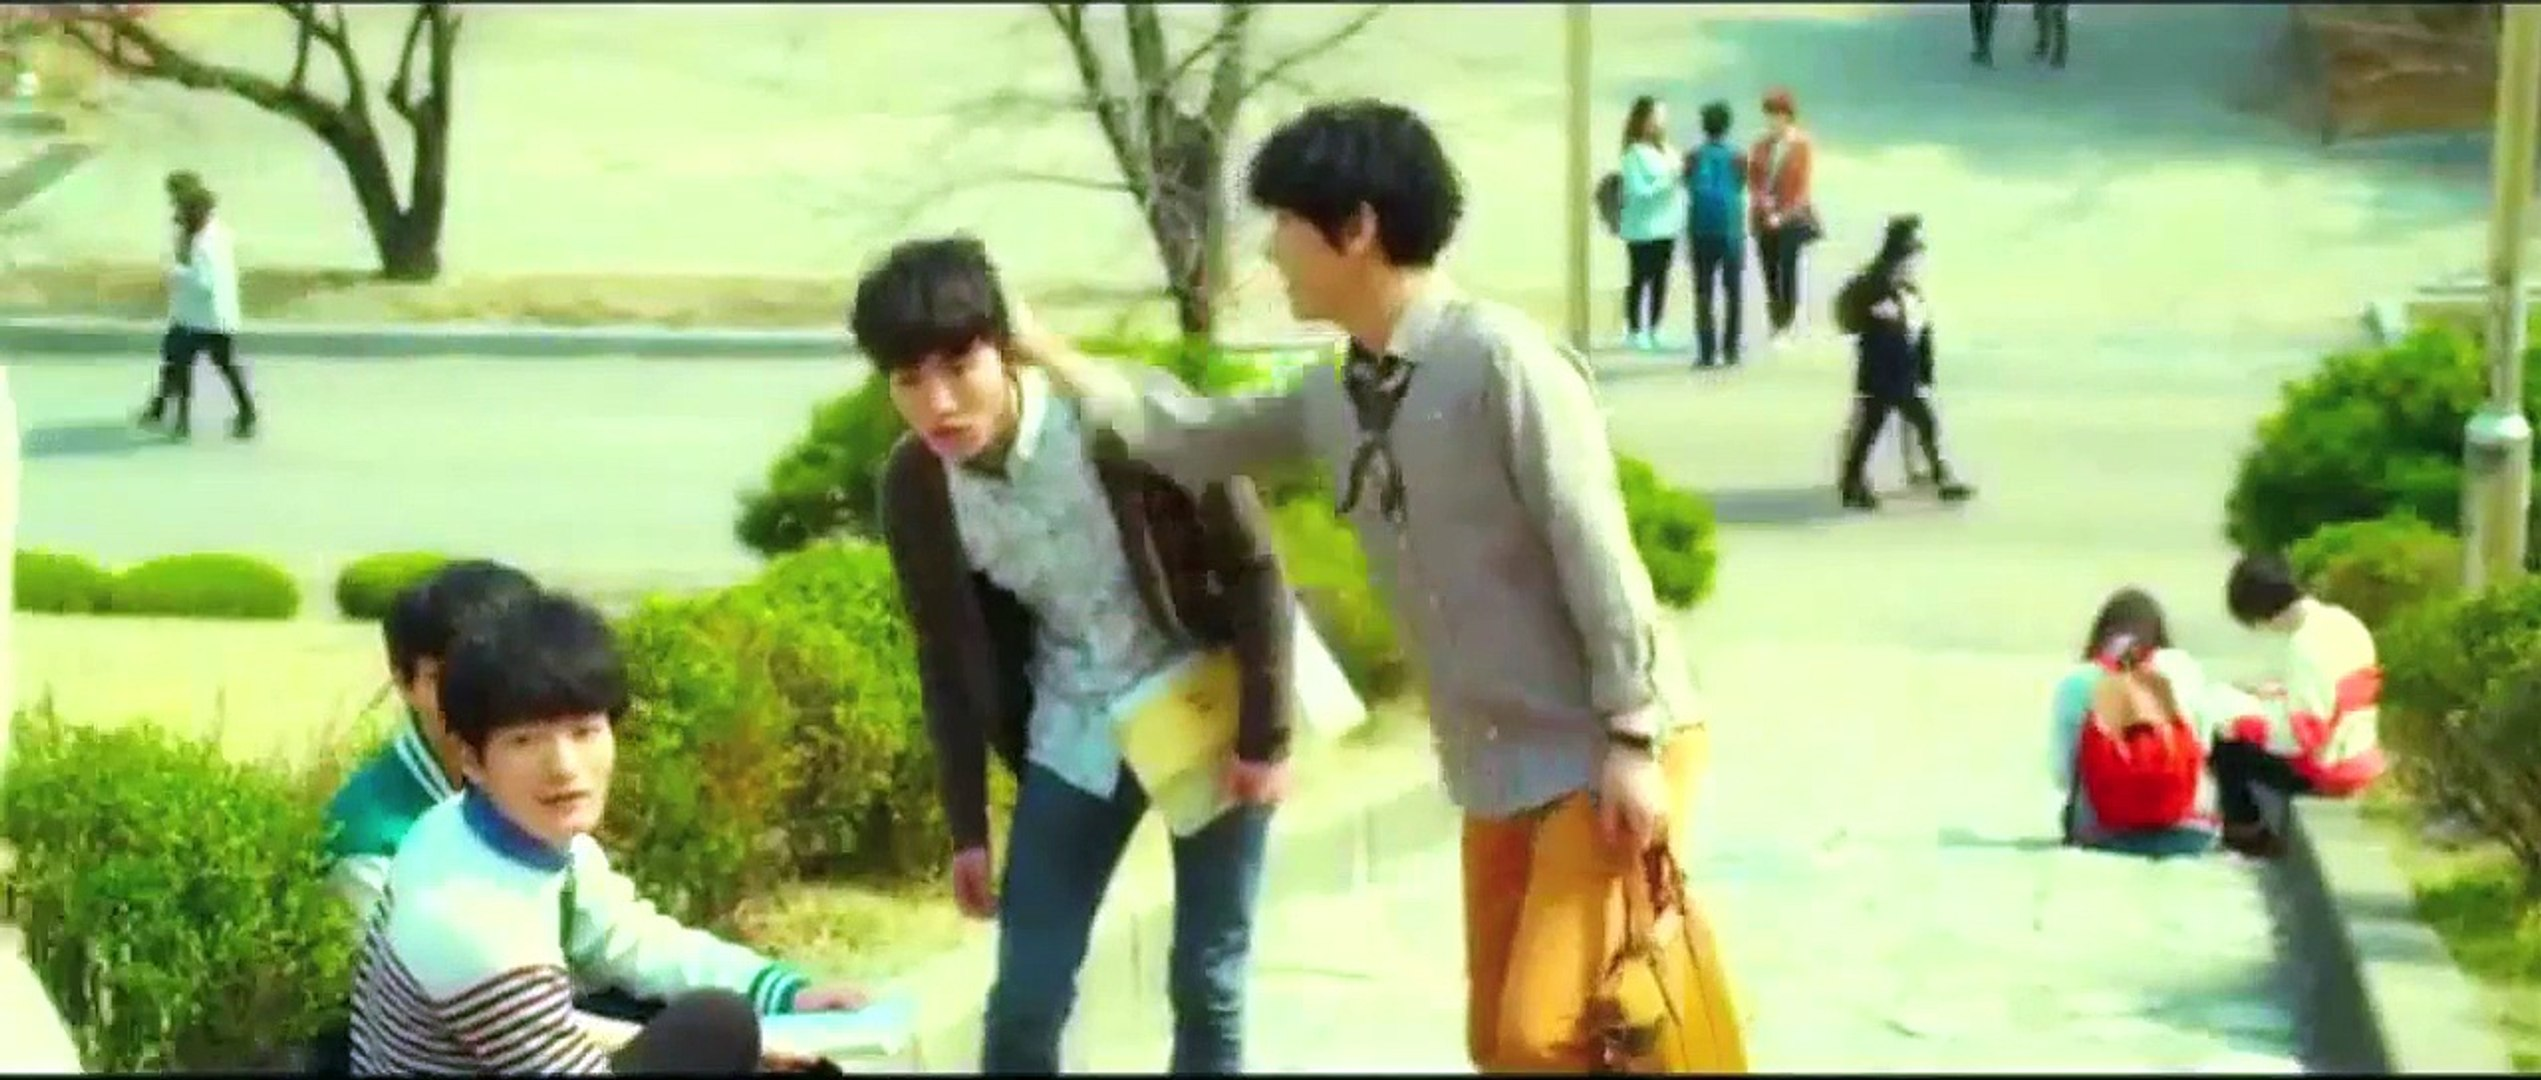 First Love 2015 Korean movies 18+ Scene-2